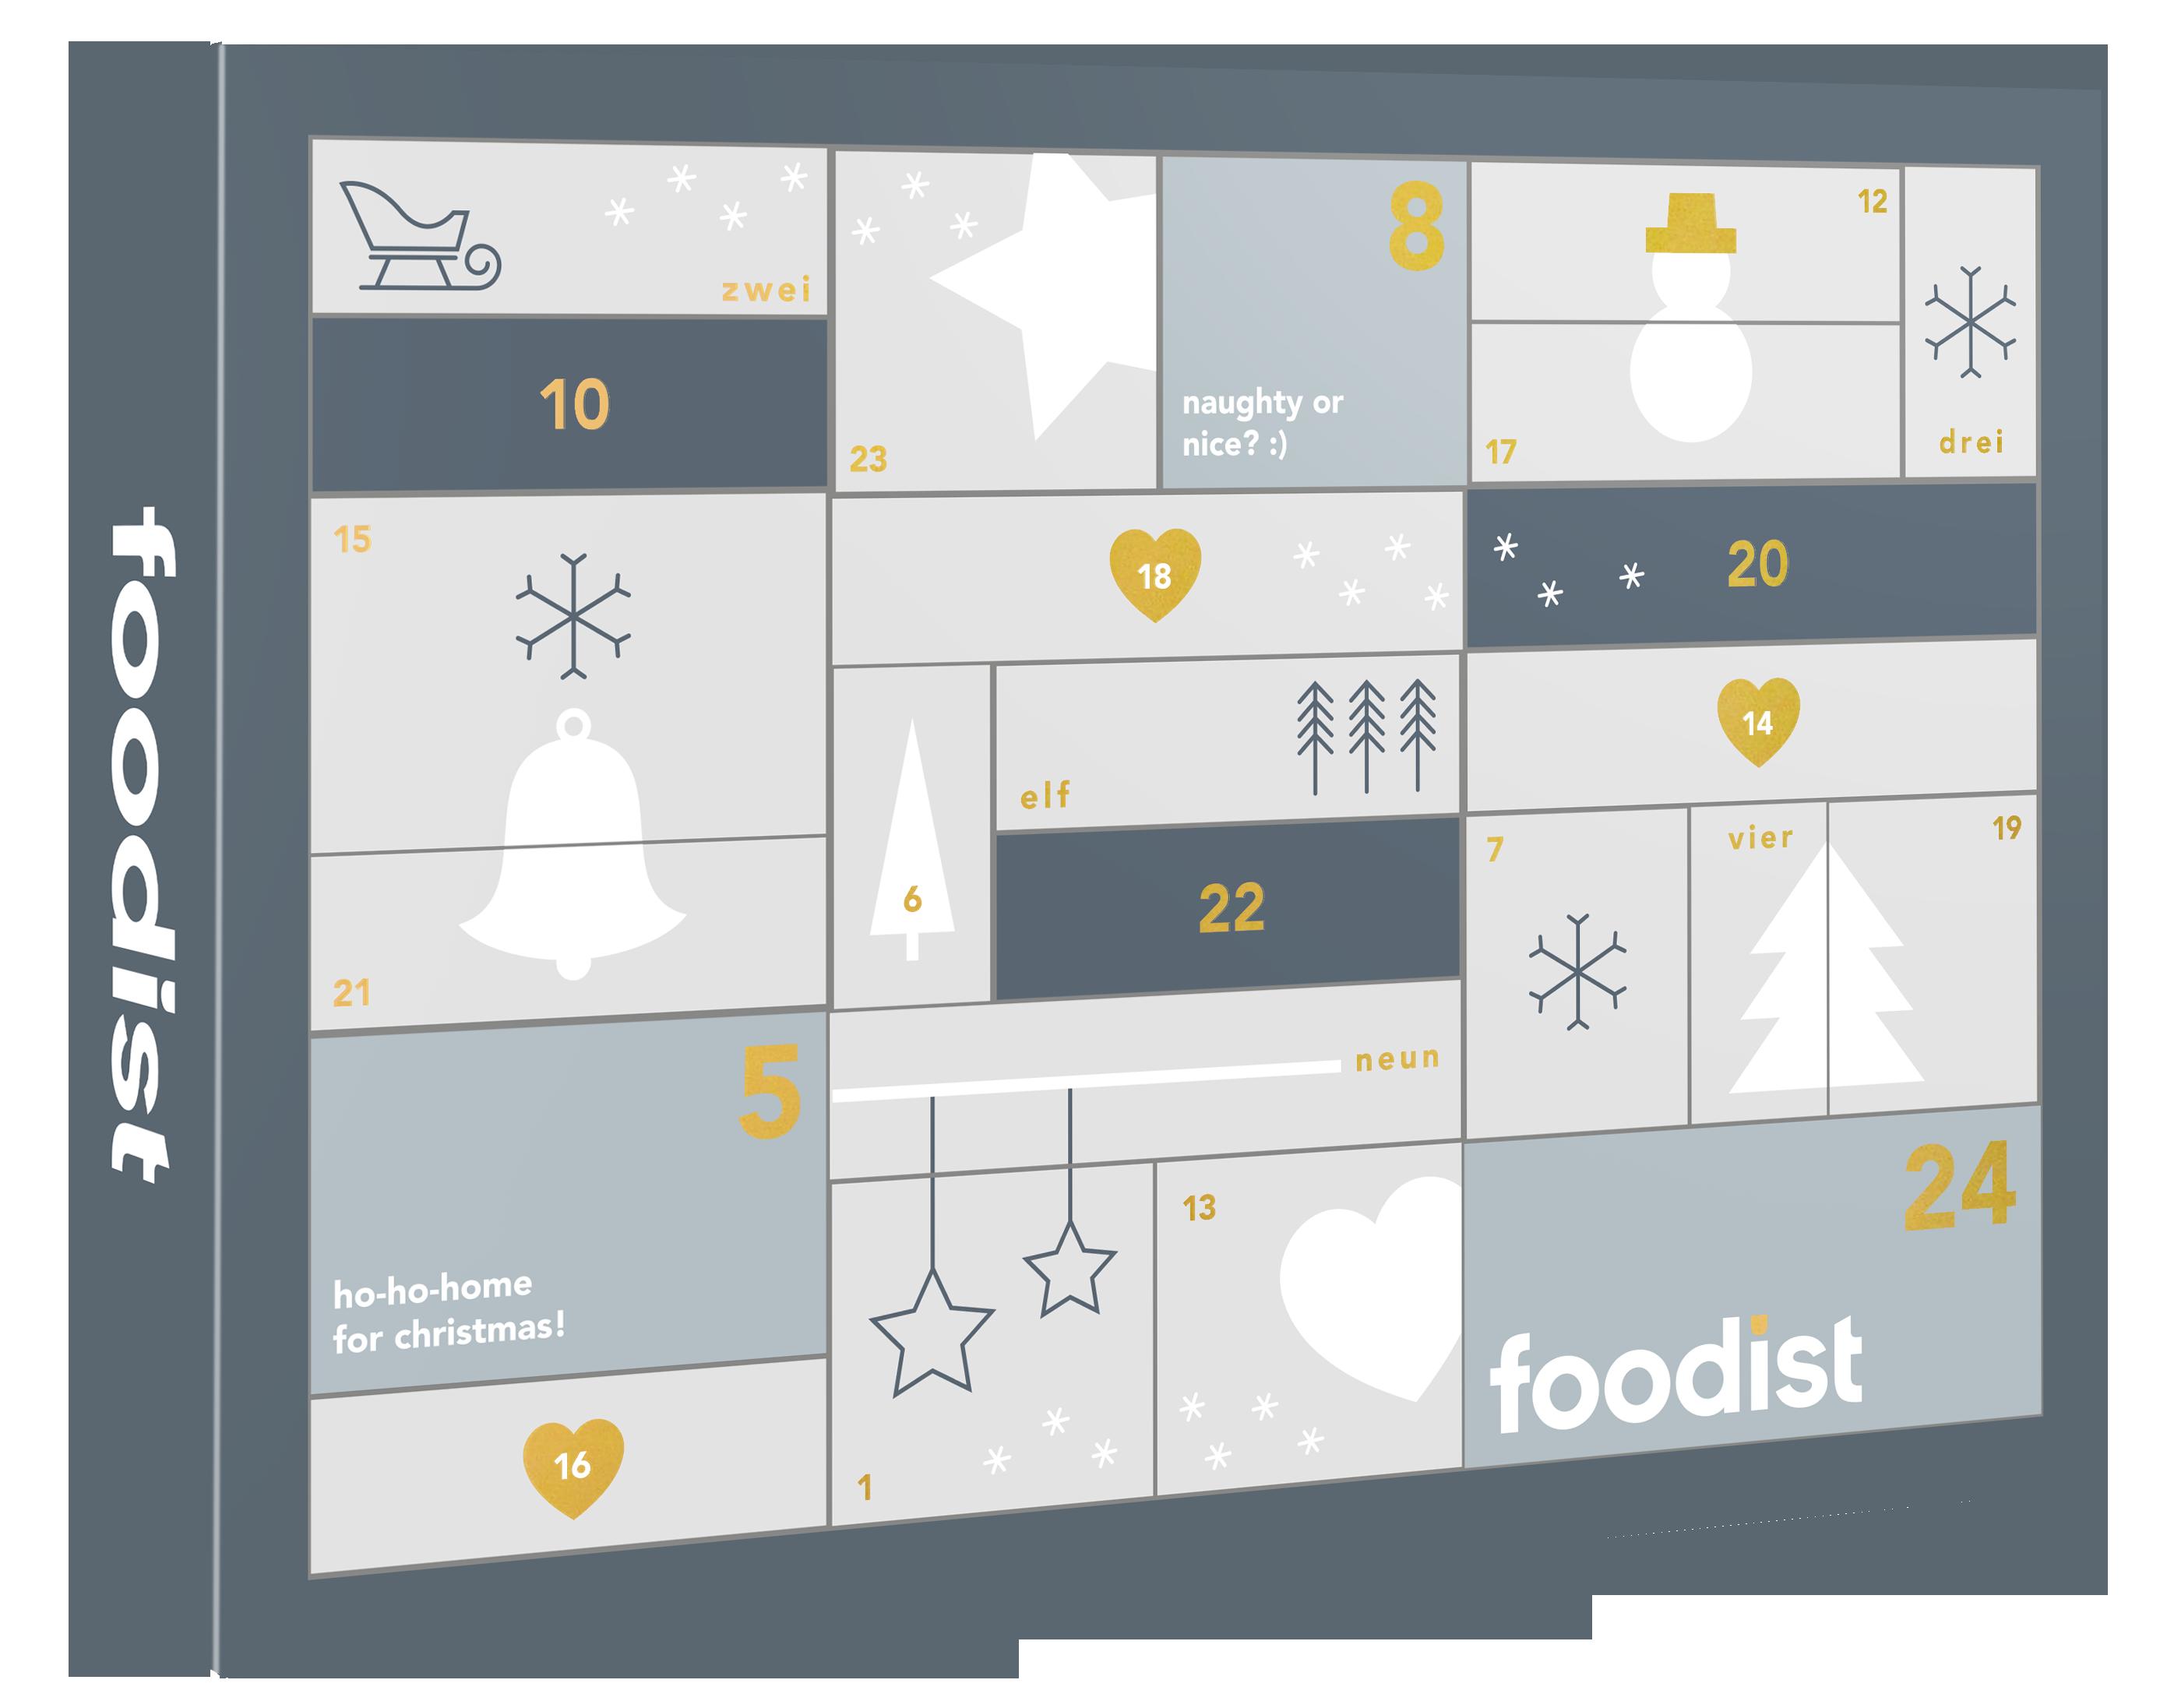 Premium Gourmet Adventskalender 2020